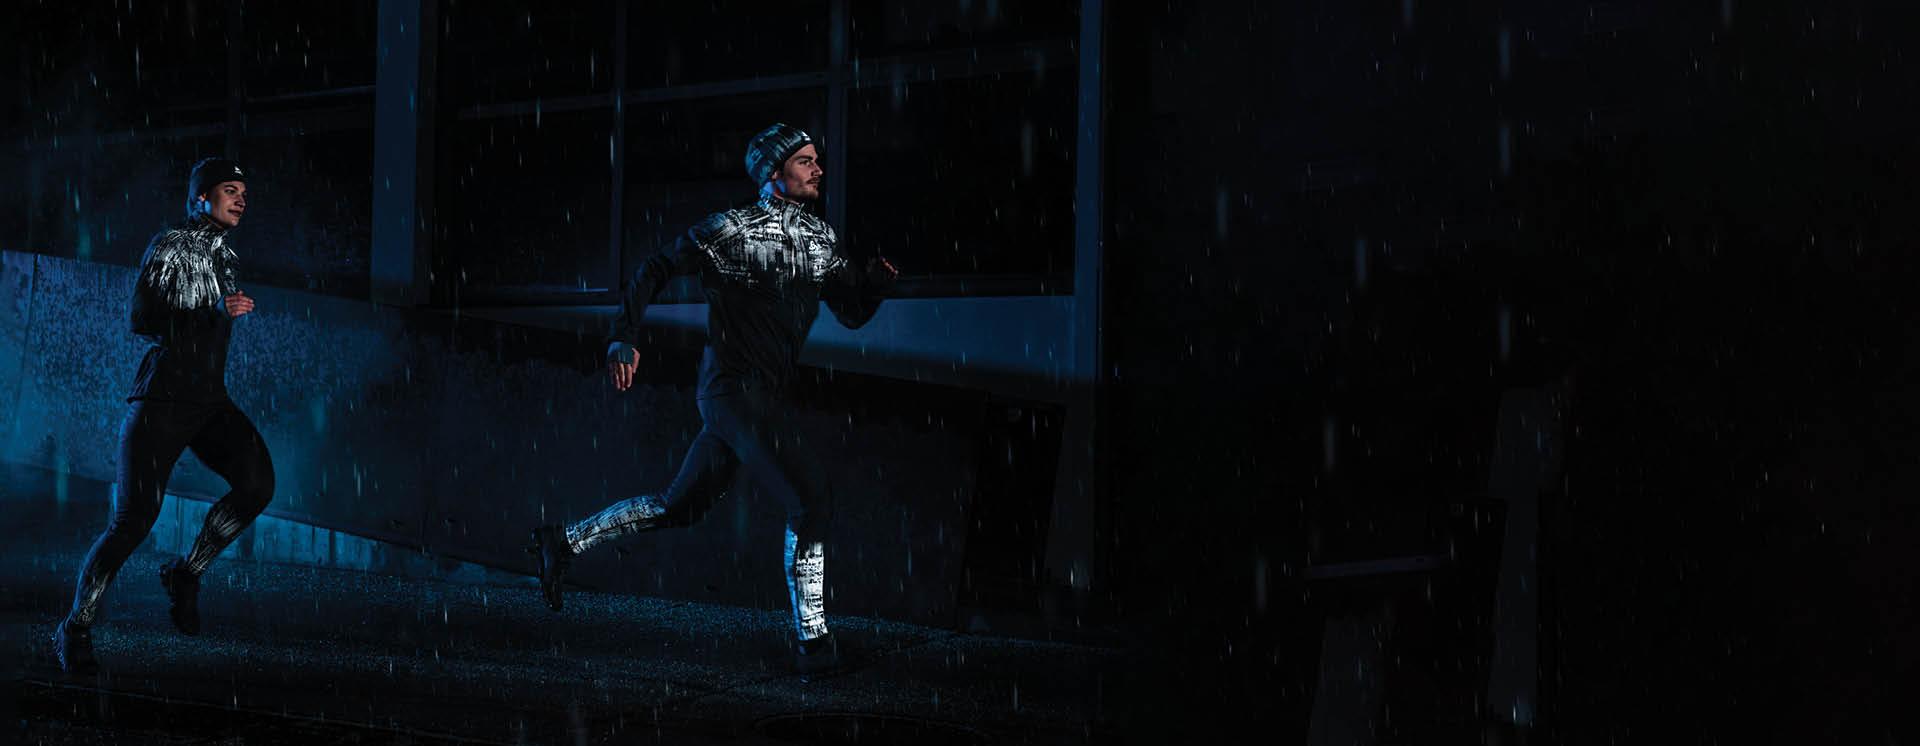 Running reflective